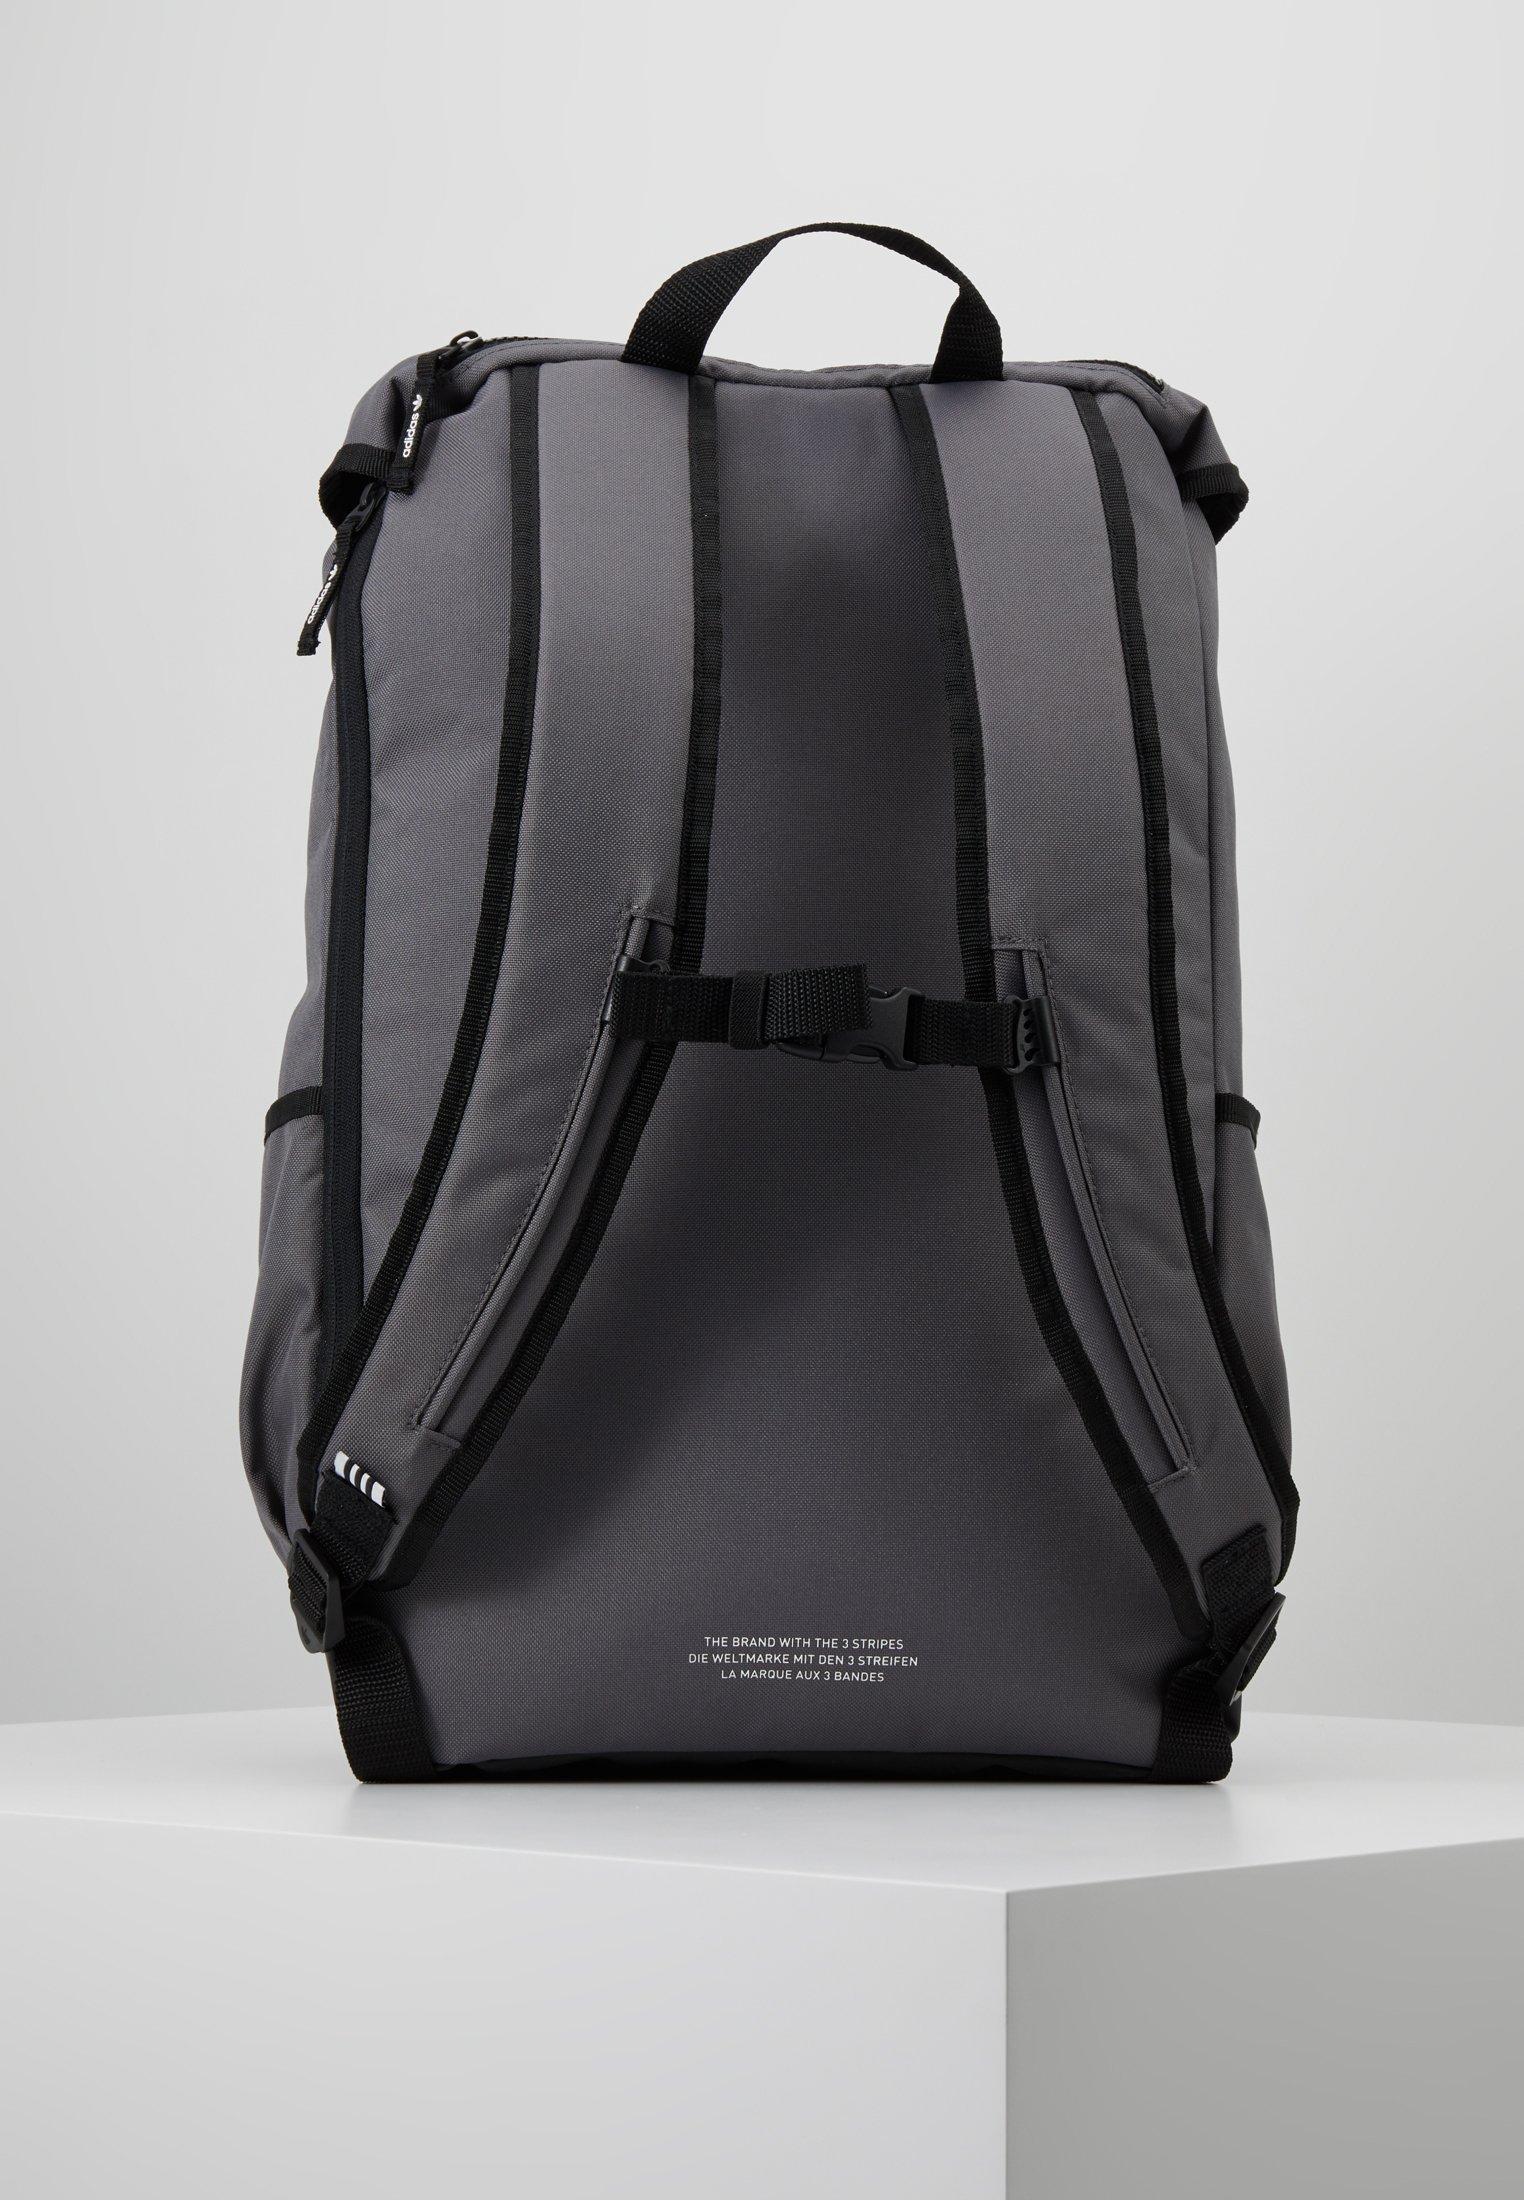 Outlet Outlet adidas Originals TOPLOADER - Rucksack - grey   men's accessories 2020 A489w